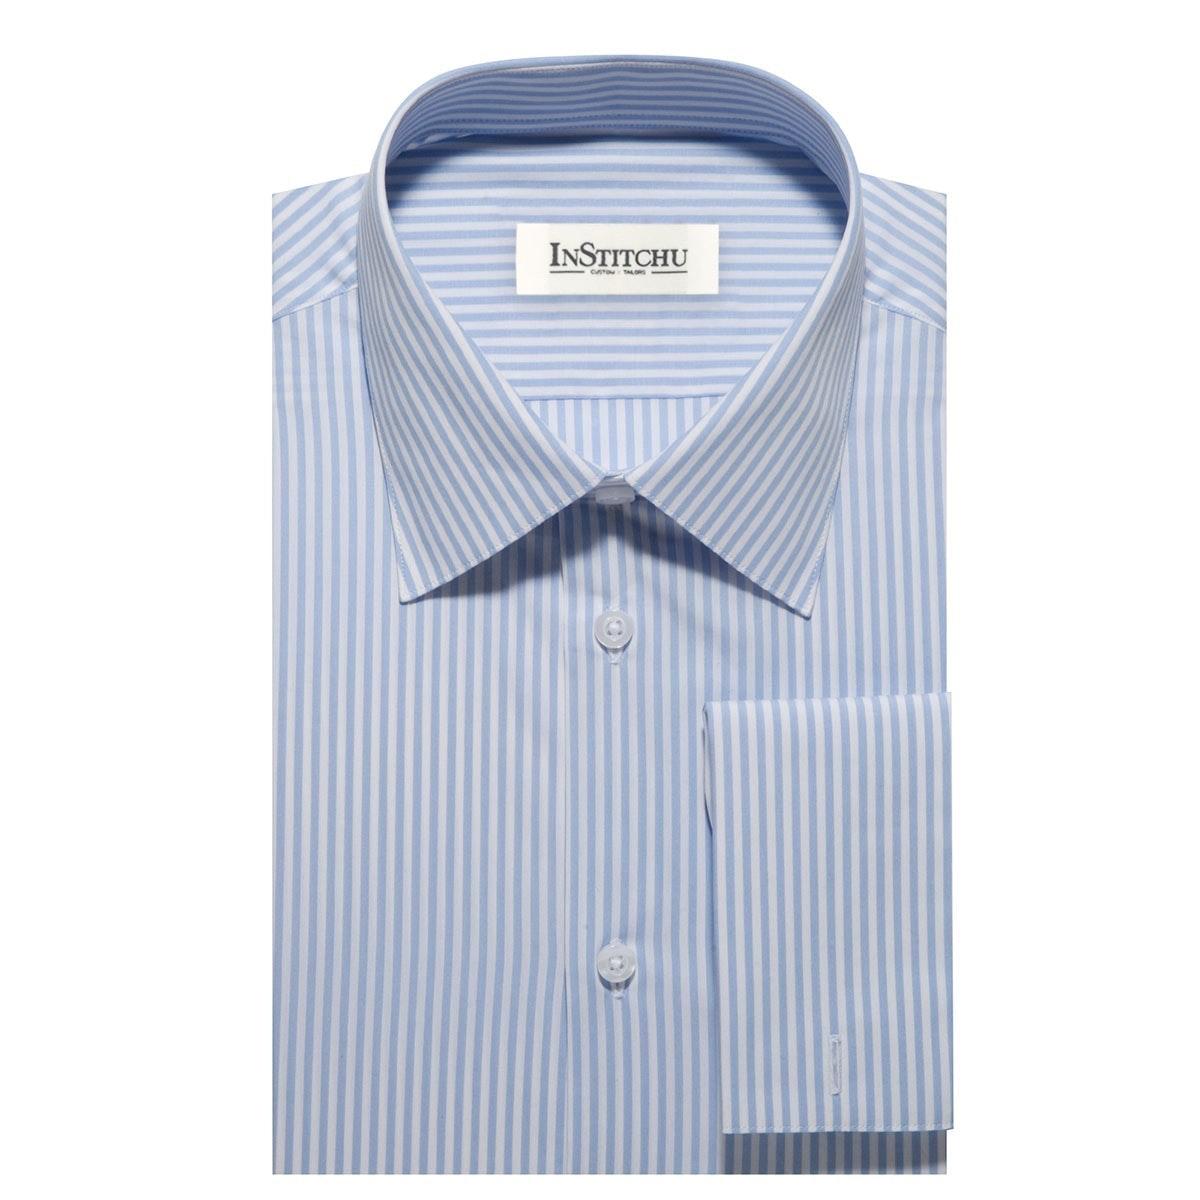 InStitchu Collection The Yaupon Blue Stripe Shirt